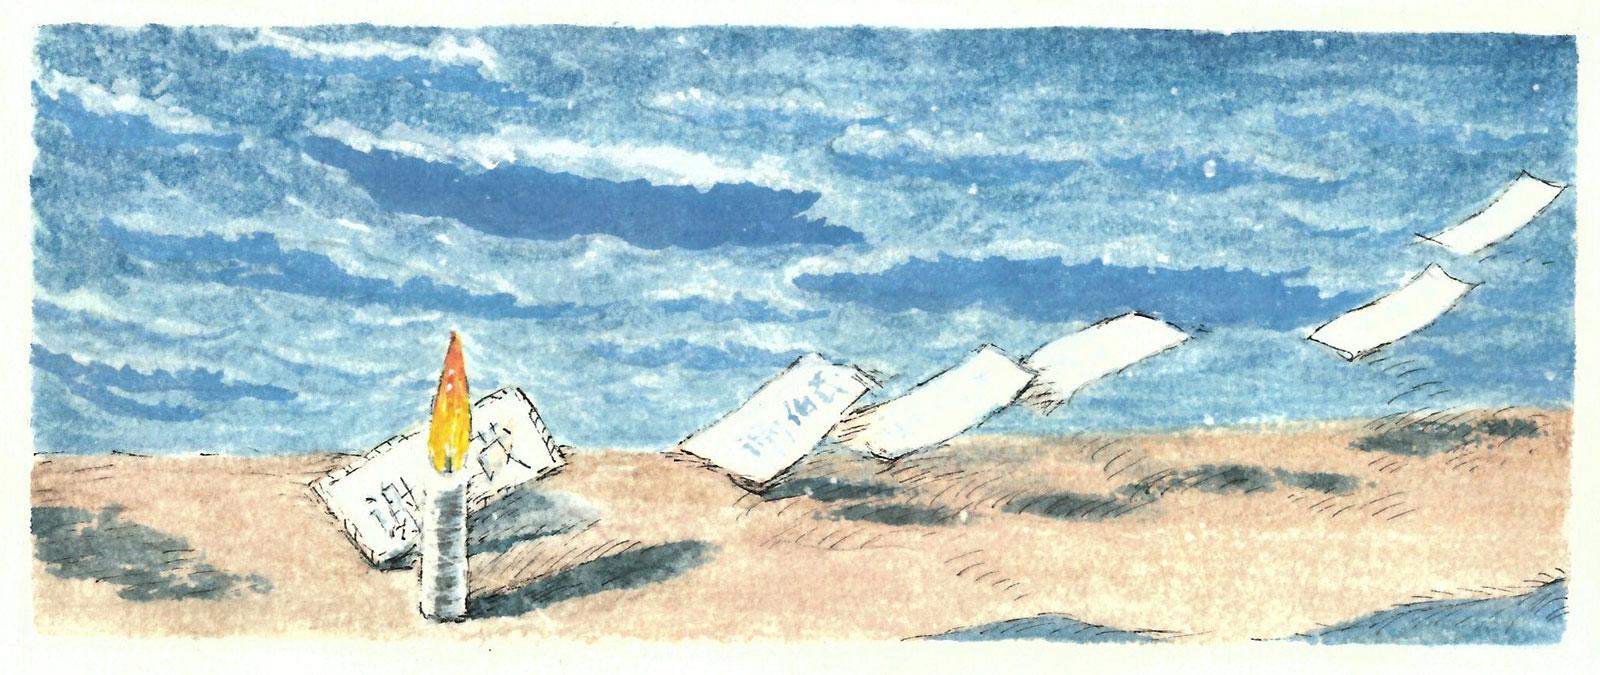 Illustration by Zhang Ruihua